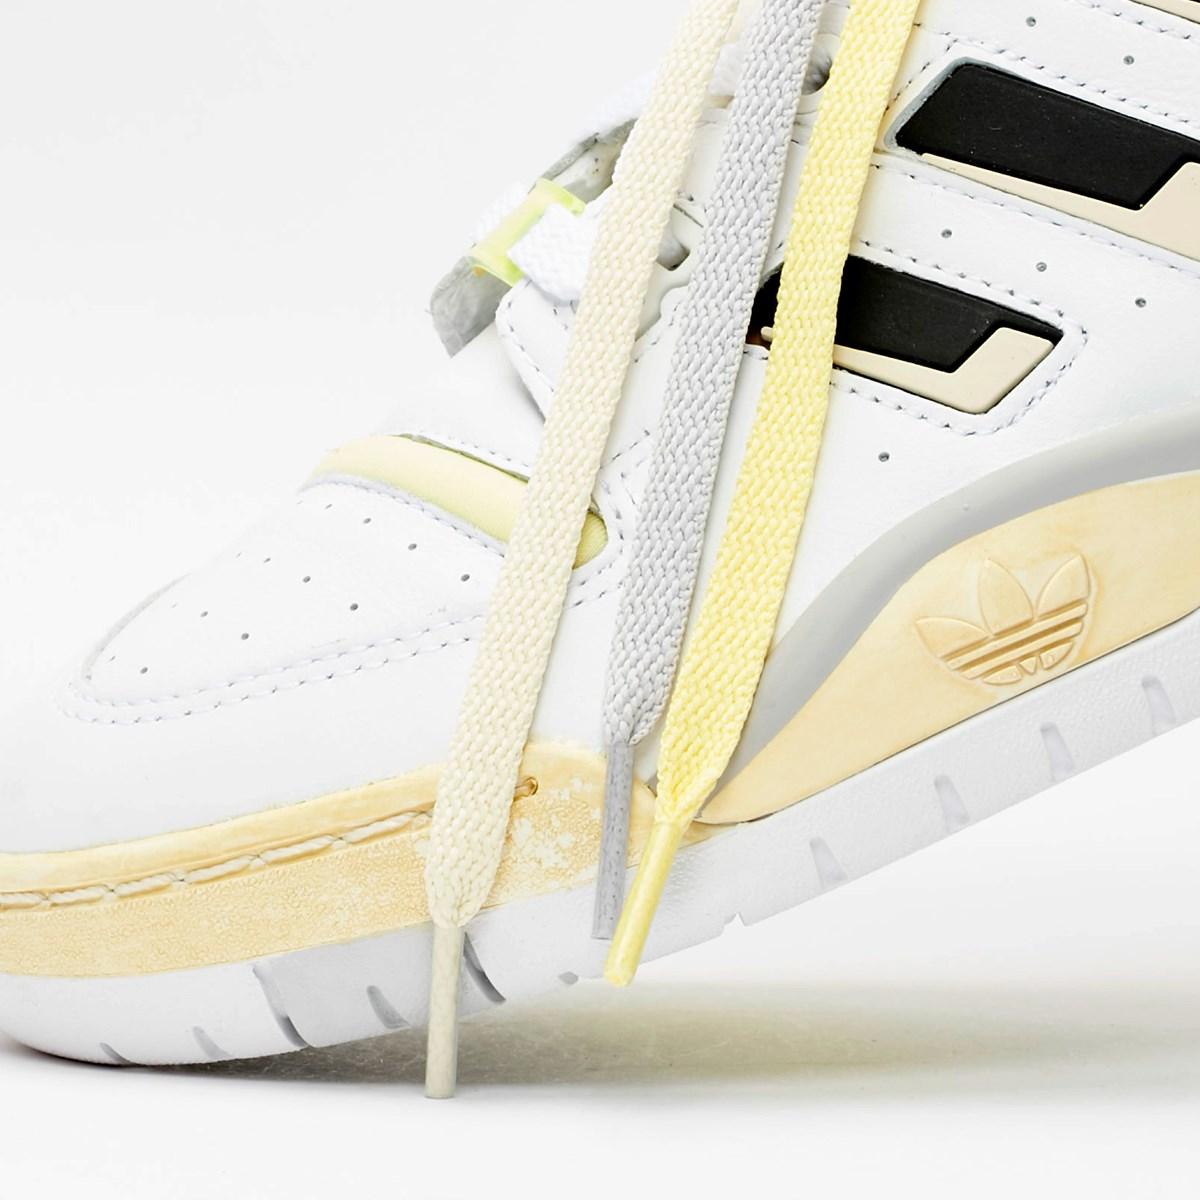 Abverkauf 75% Adidas Schuhe Forest Grove BD7940 Carbon